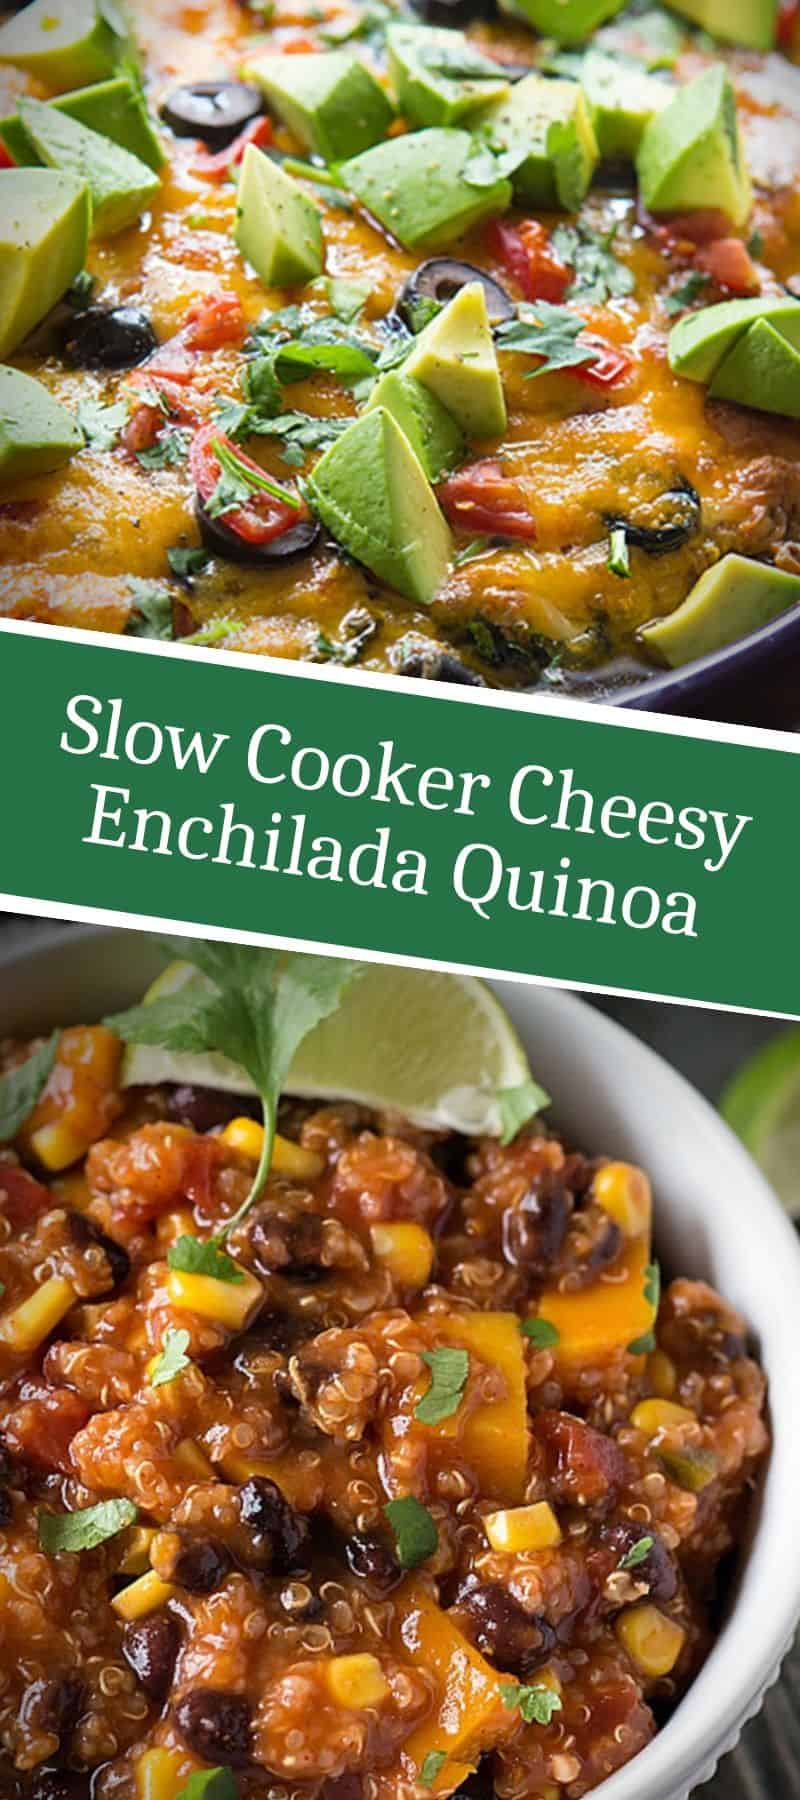 Slow Cooker Cheesy Enchilada Quinoa 3